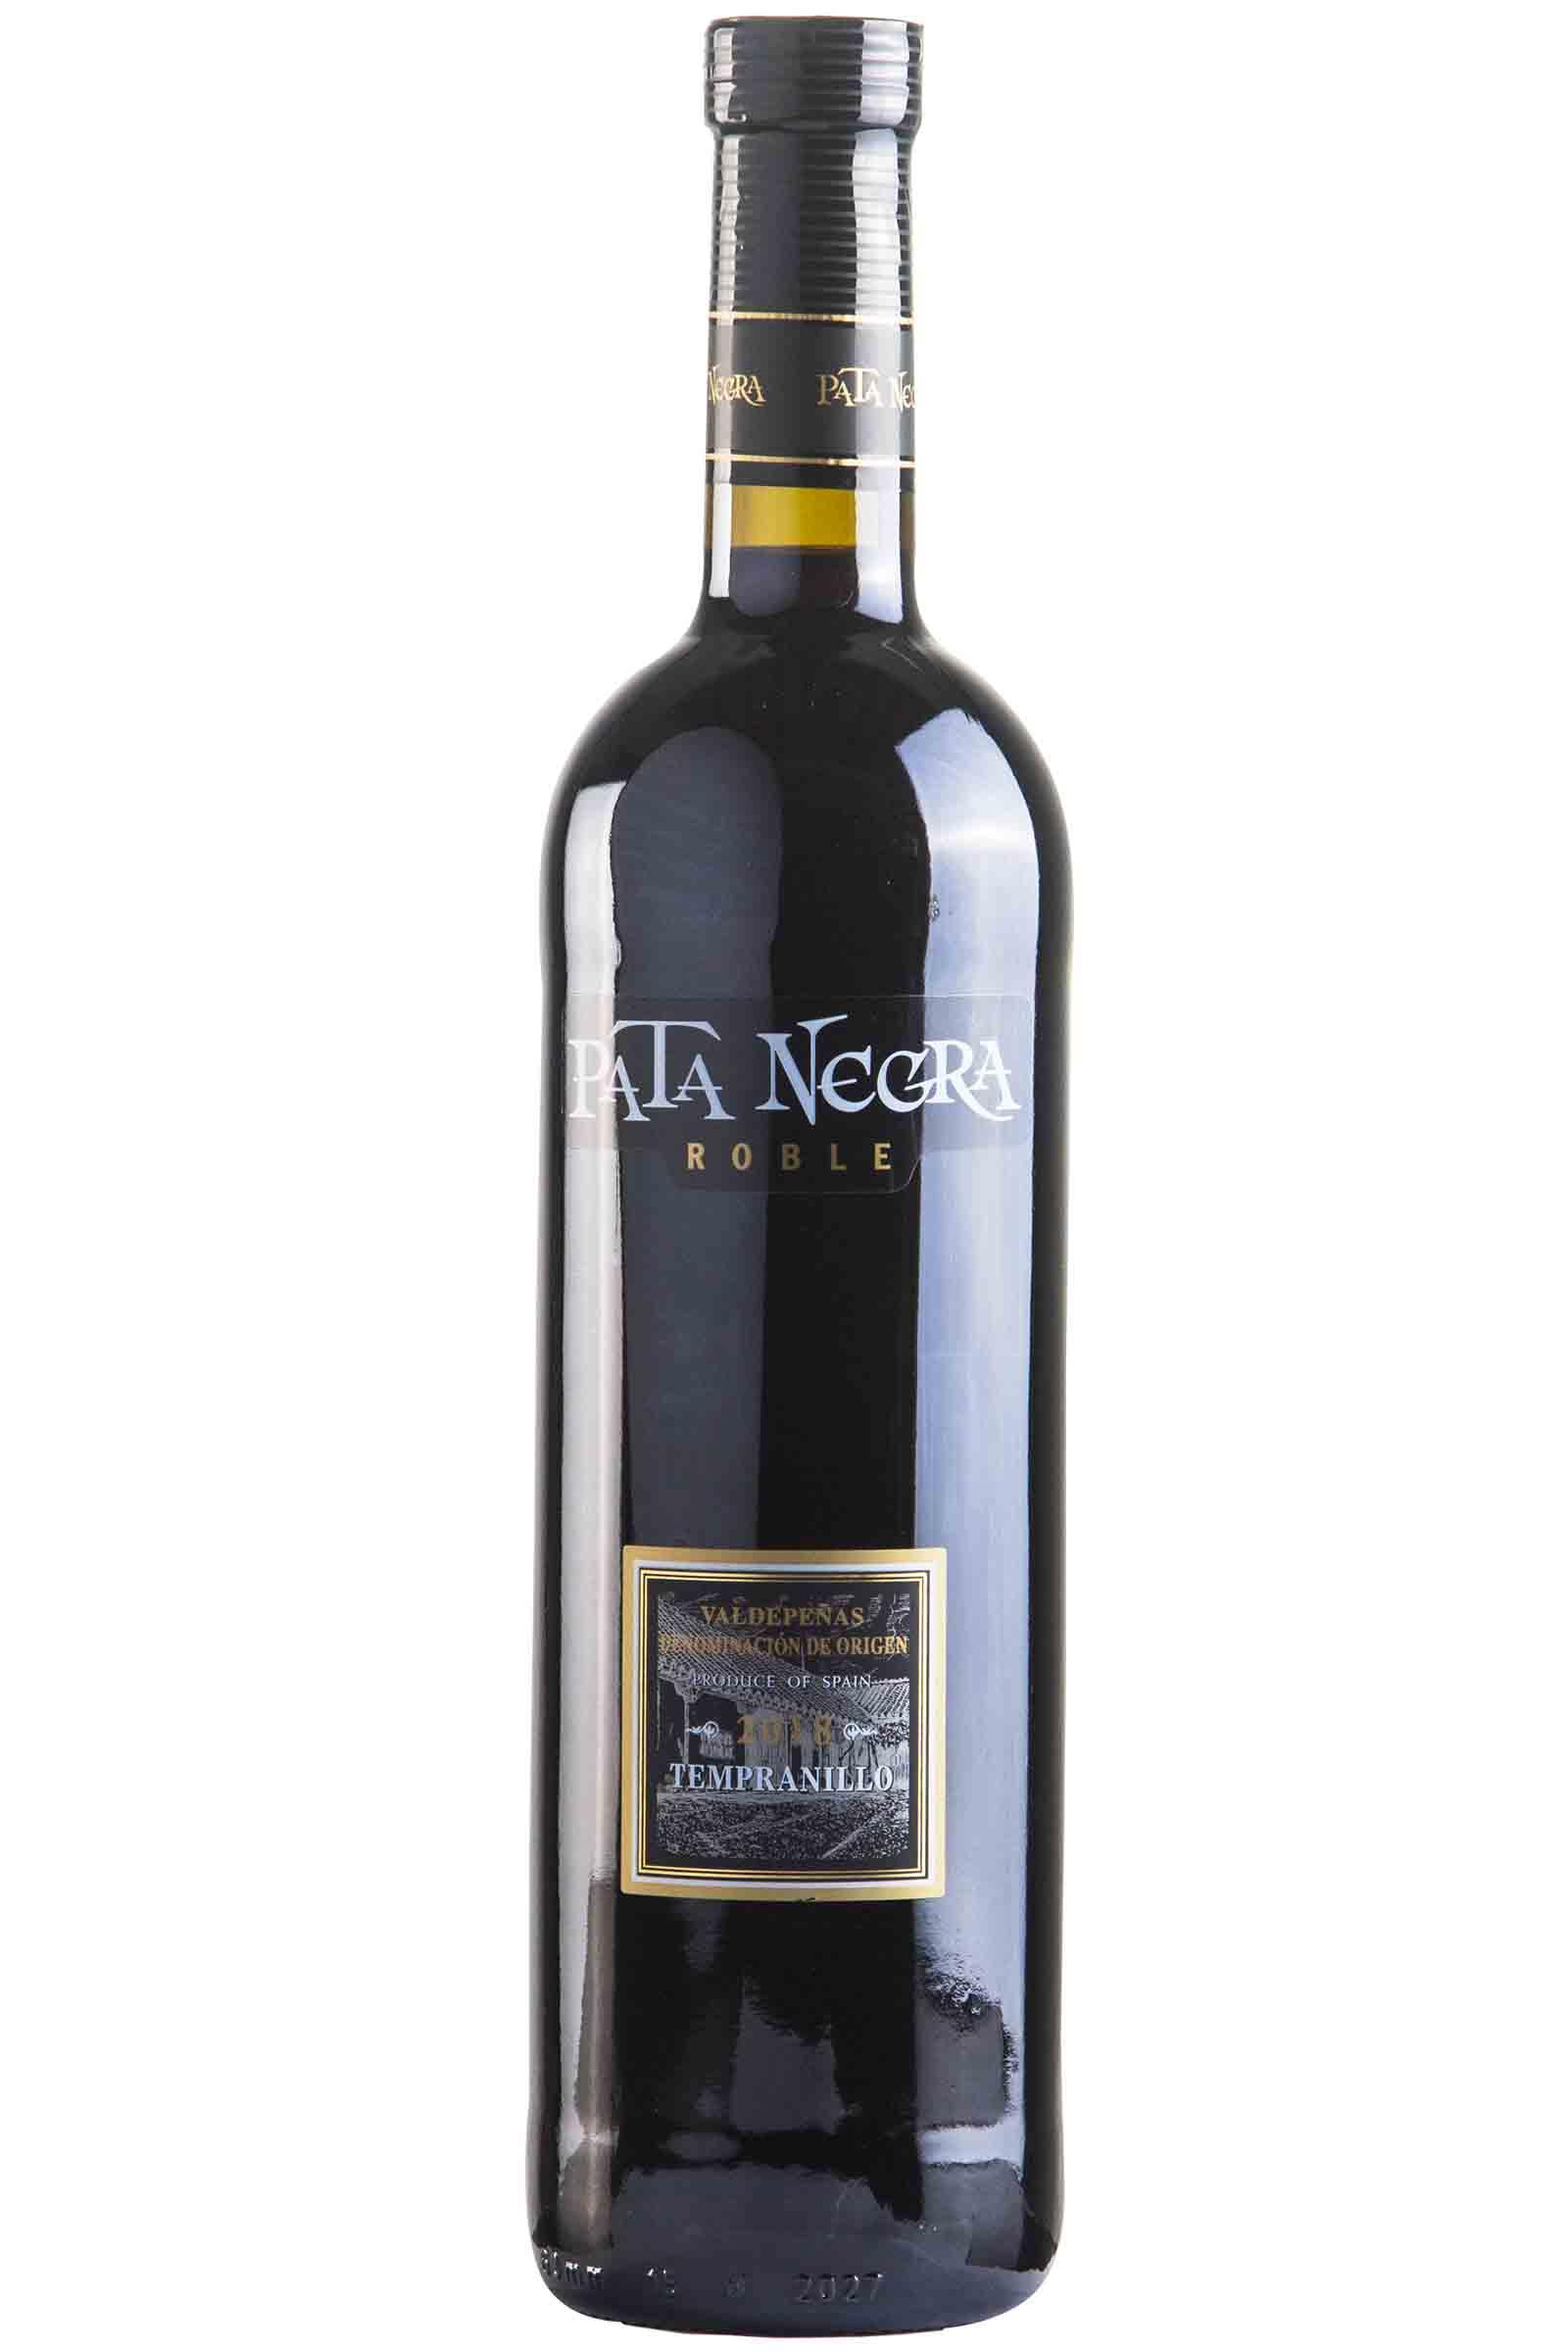 Vino Pata Negra Valdepeñas Roble 750ml